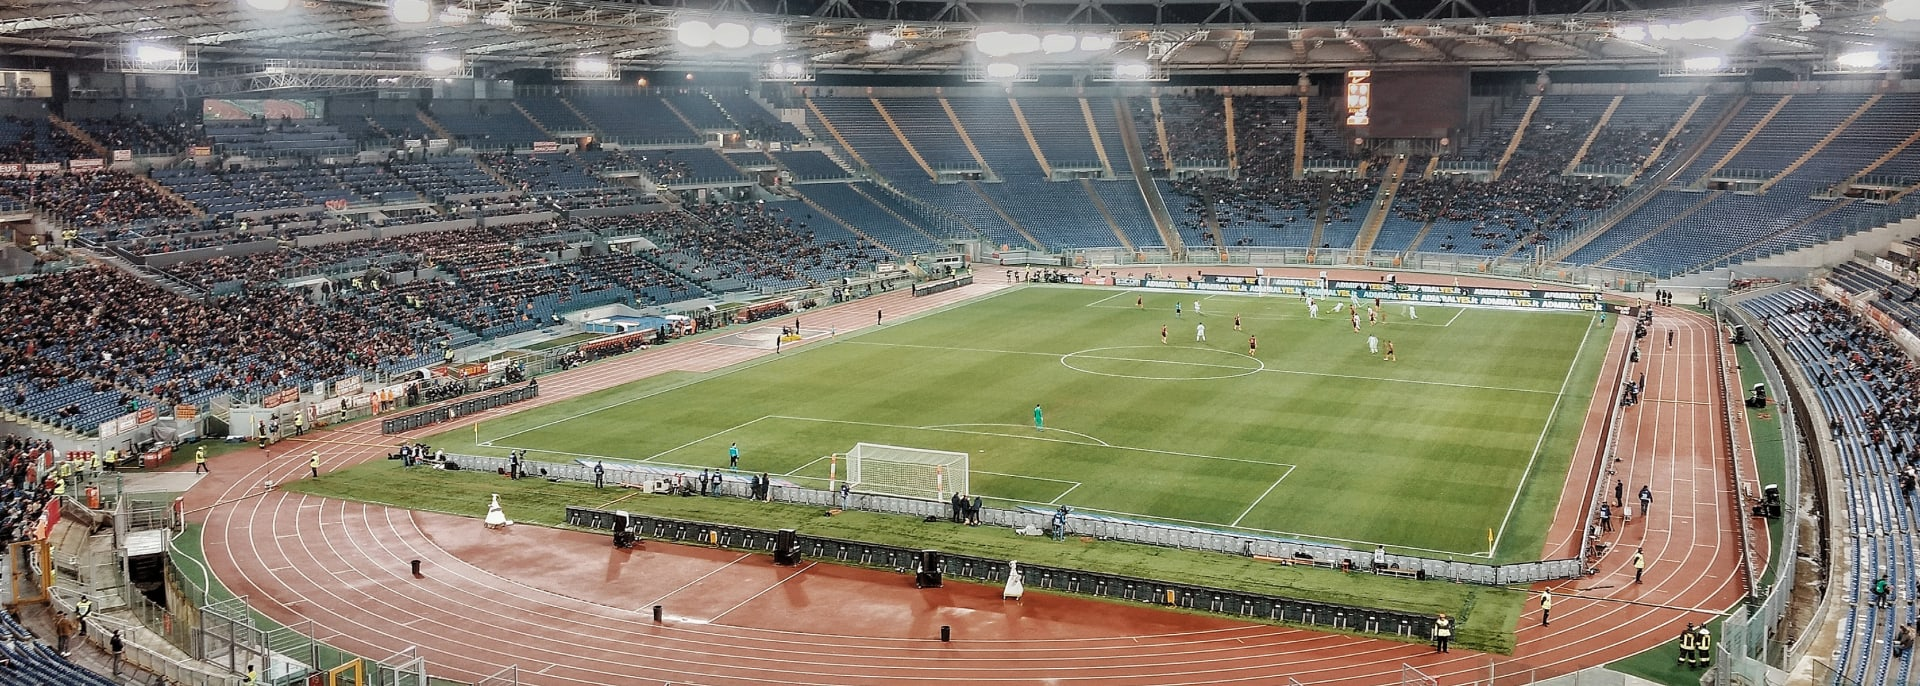 Serie A, Fussball, Sport Live Reisen, Knecht Reisen